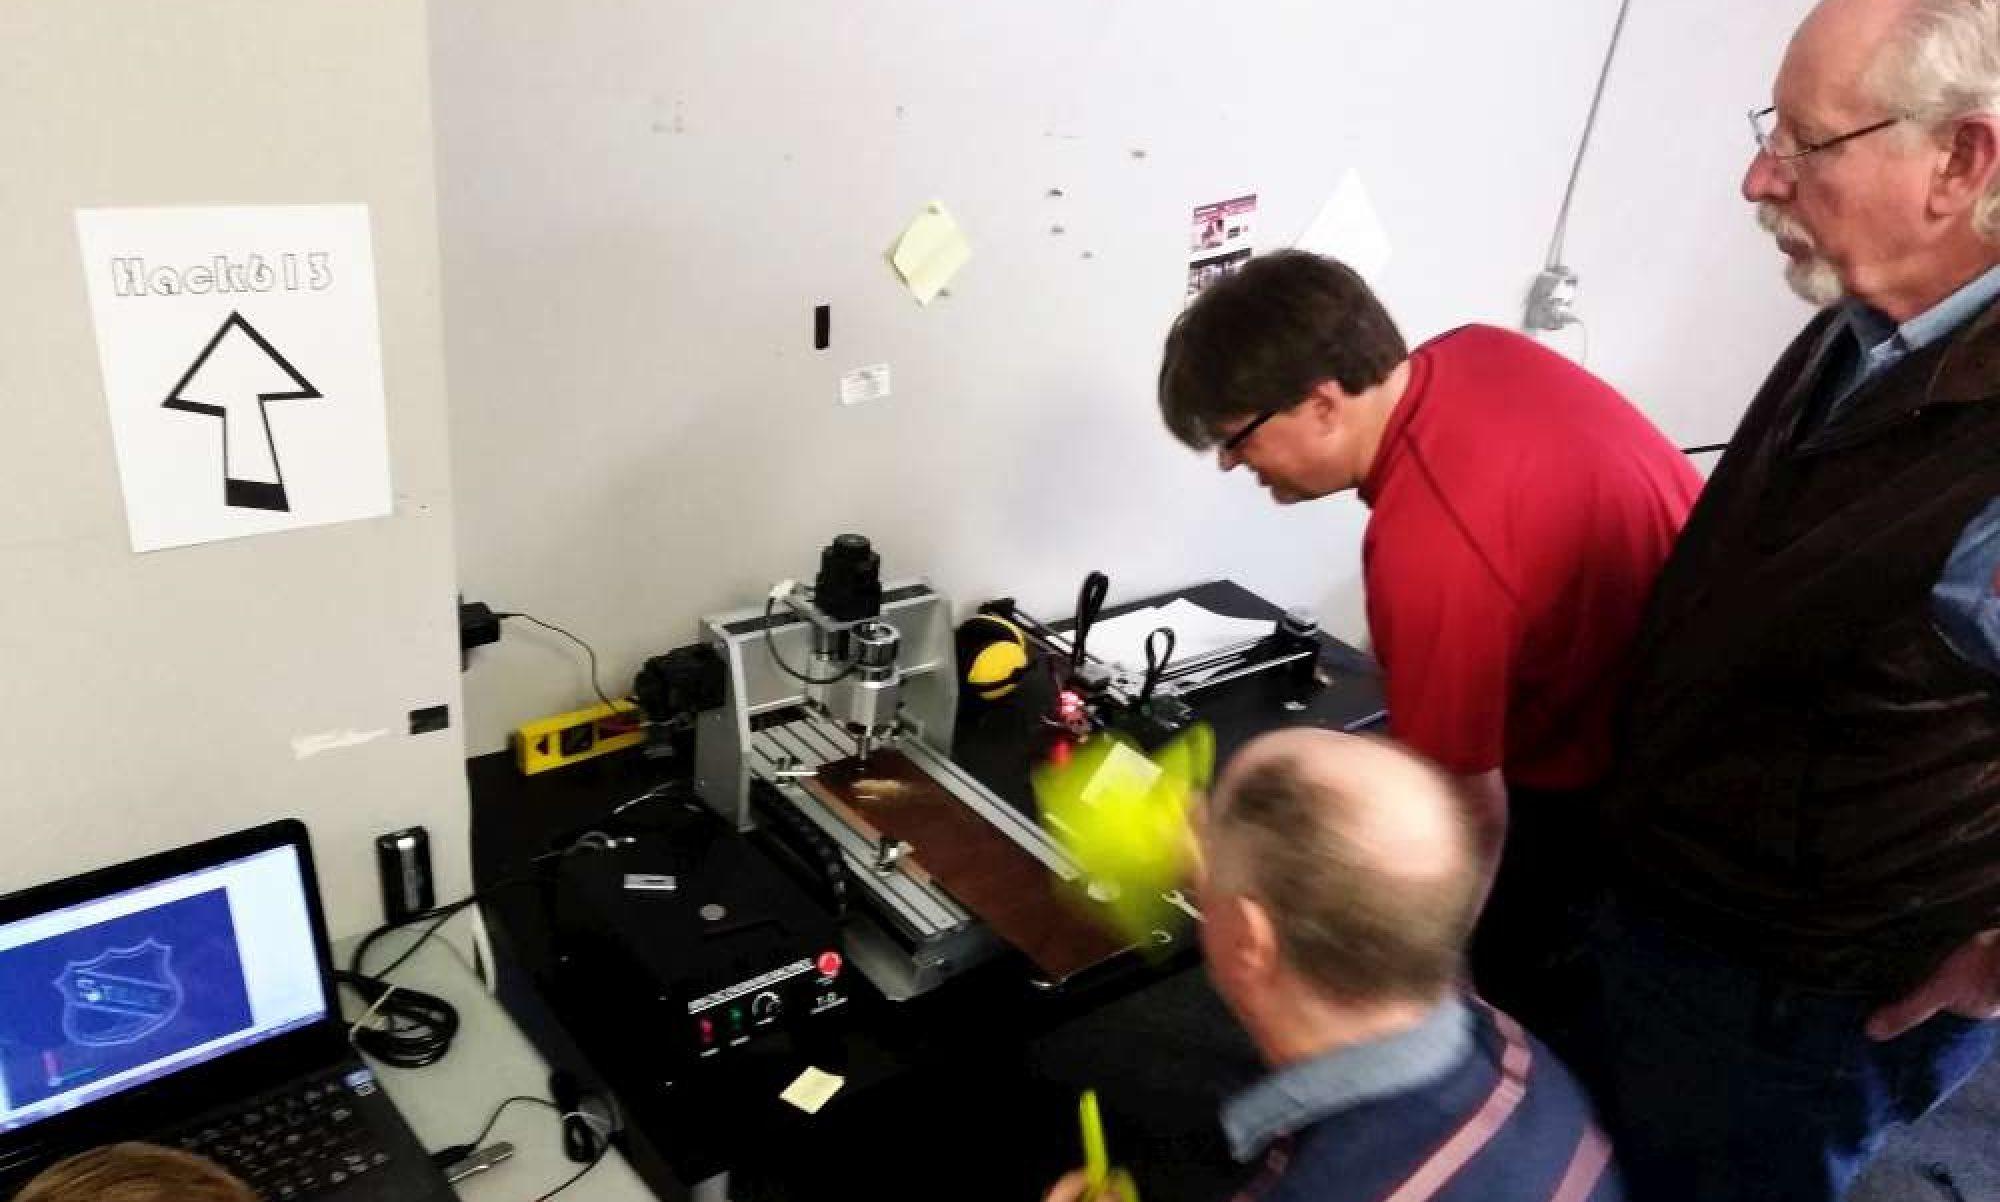 Hack613 - Ottawa Makerspace!